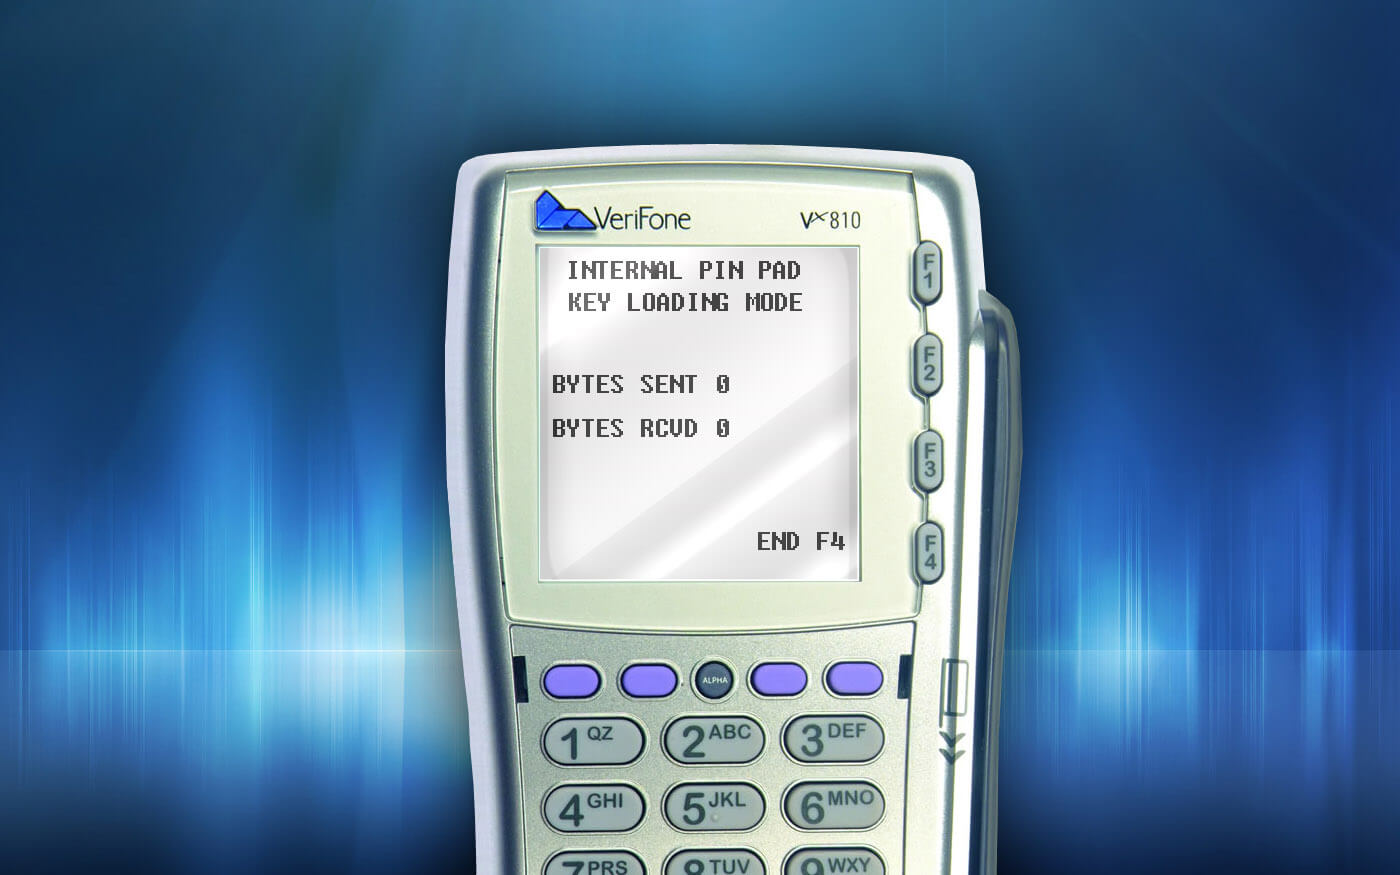 Сброс TAMPER на пин-паде VeriFone VX810